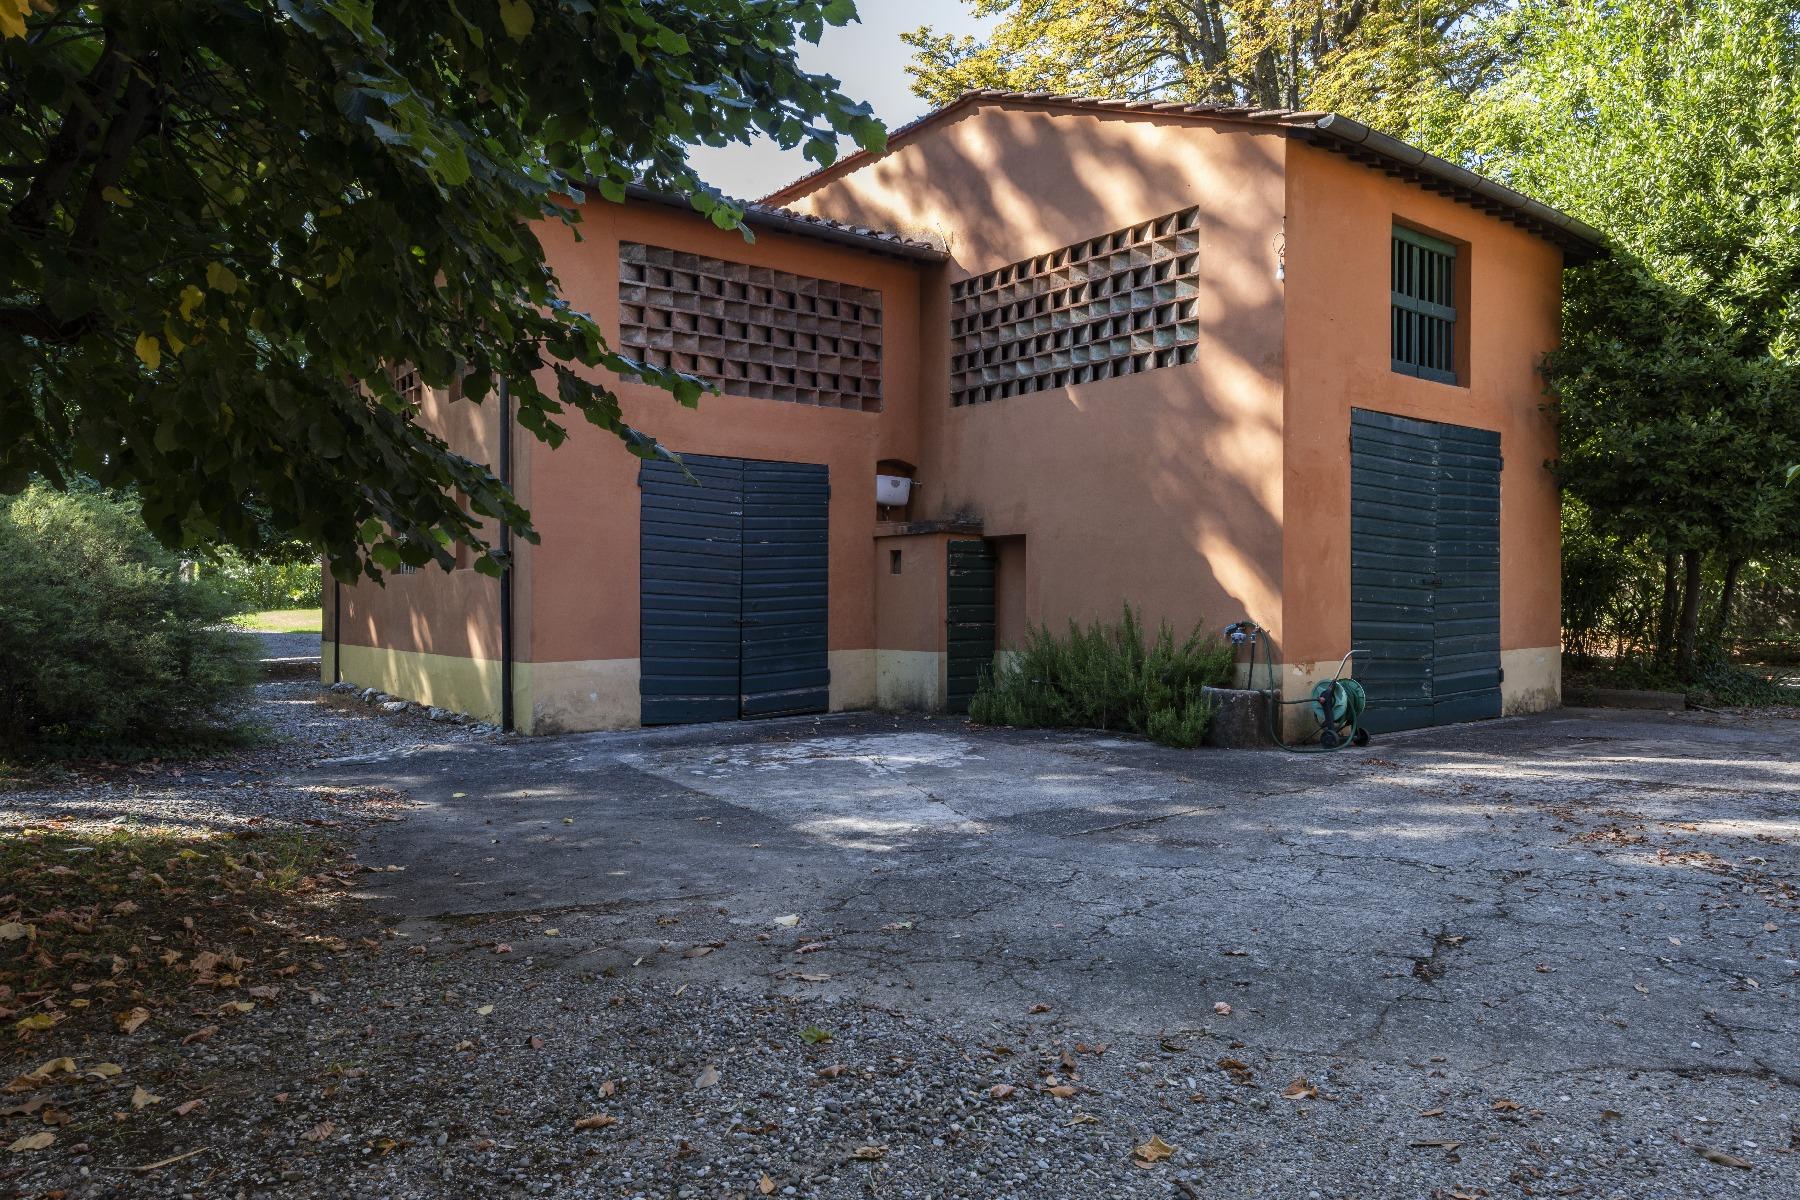 Villa in Vendita a Lucca: 5 locali, 660 mq - Foto 22